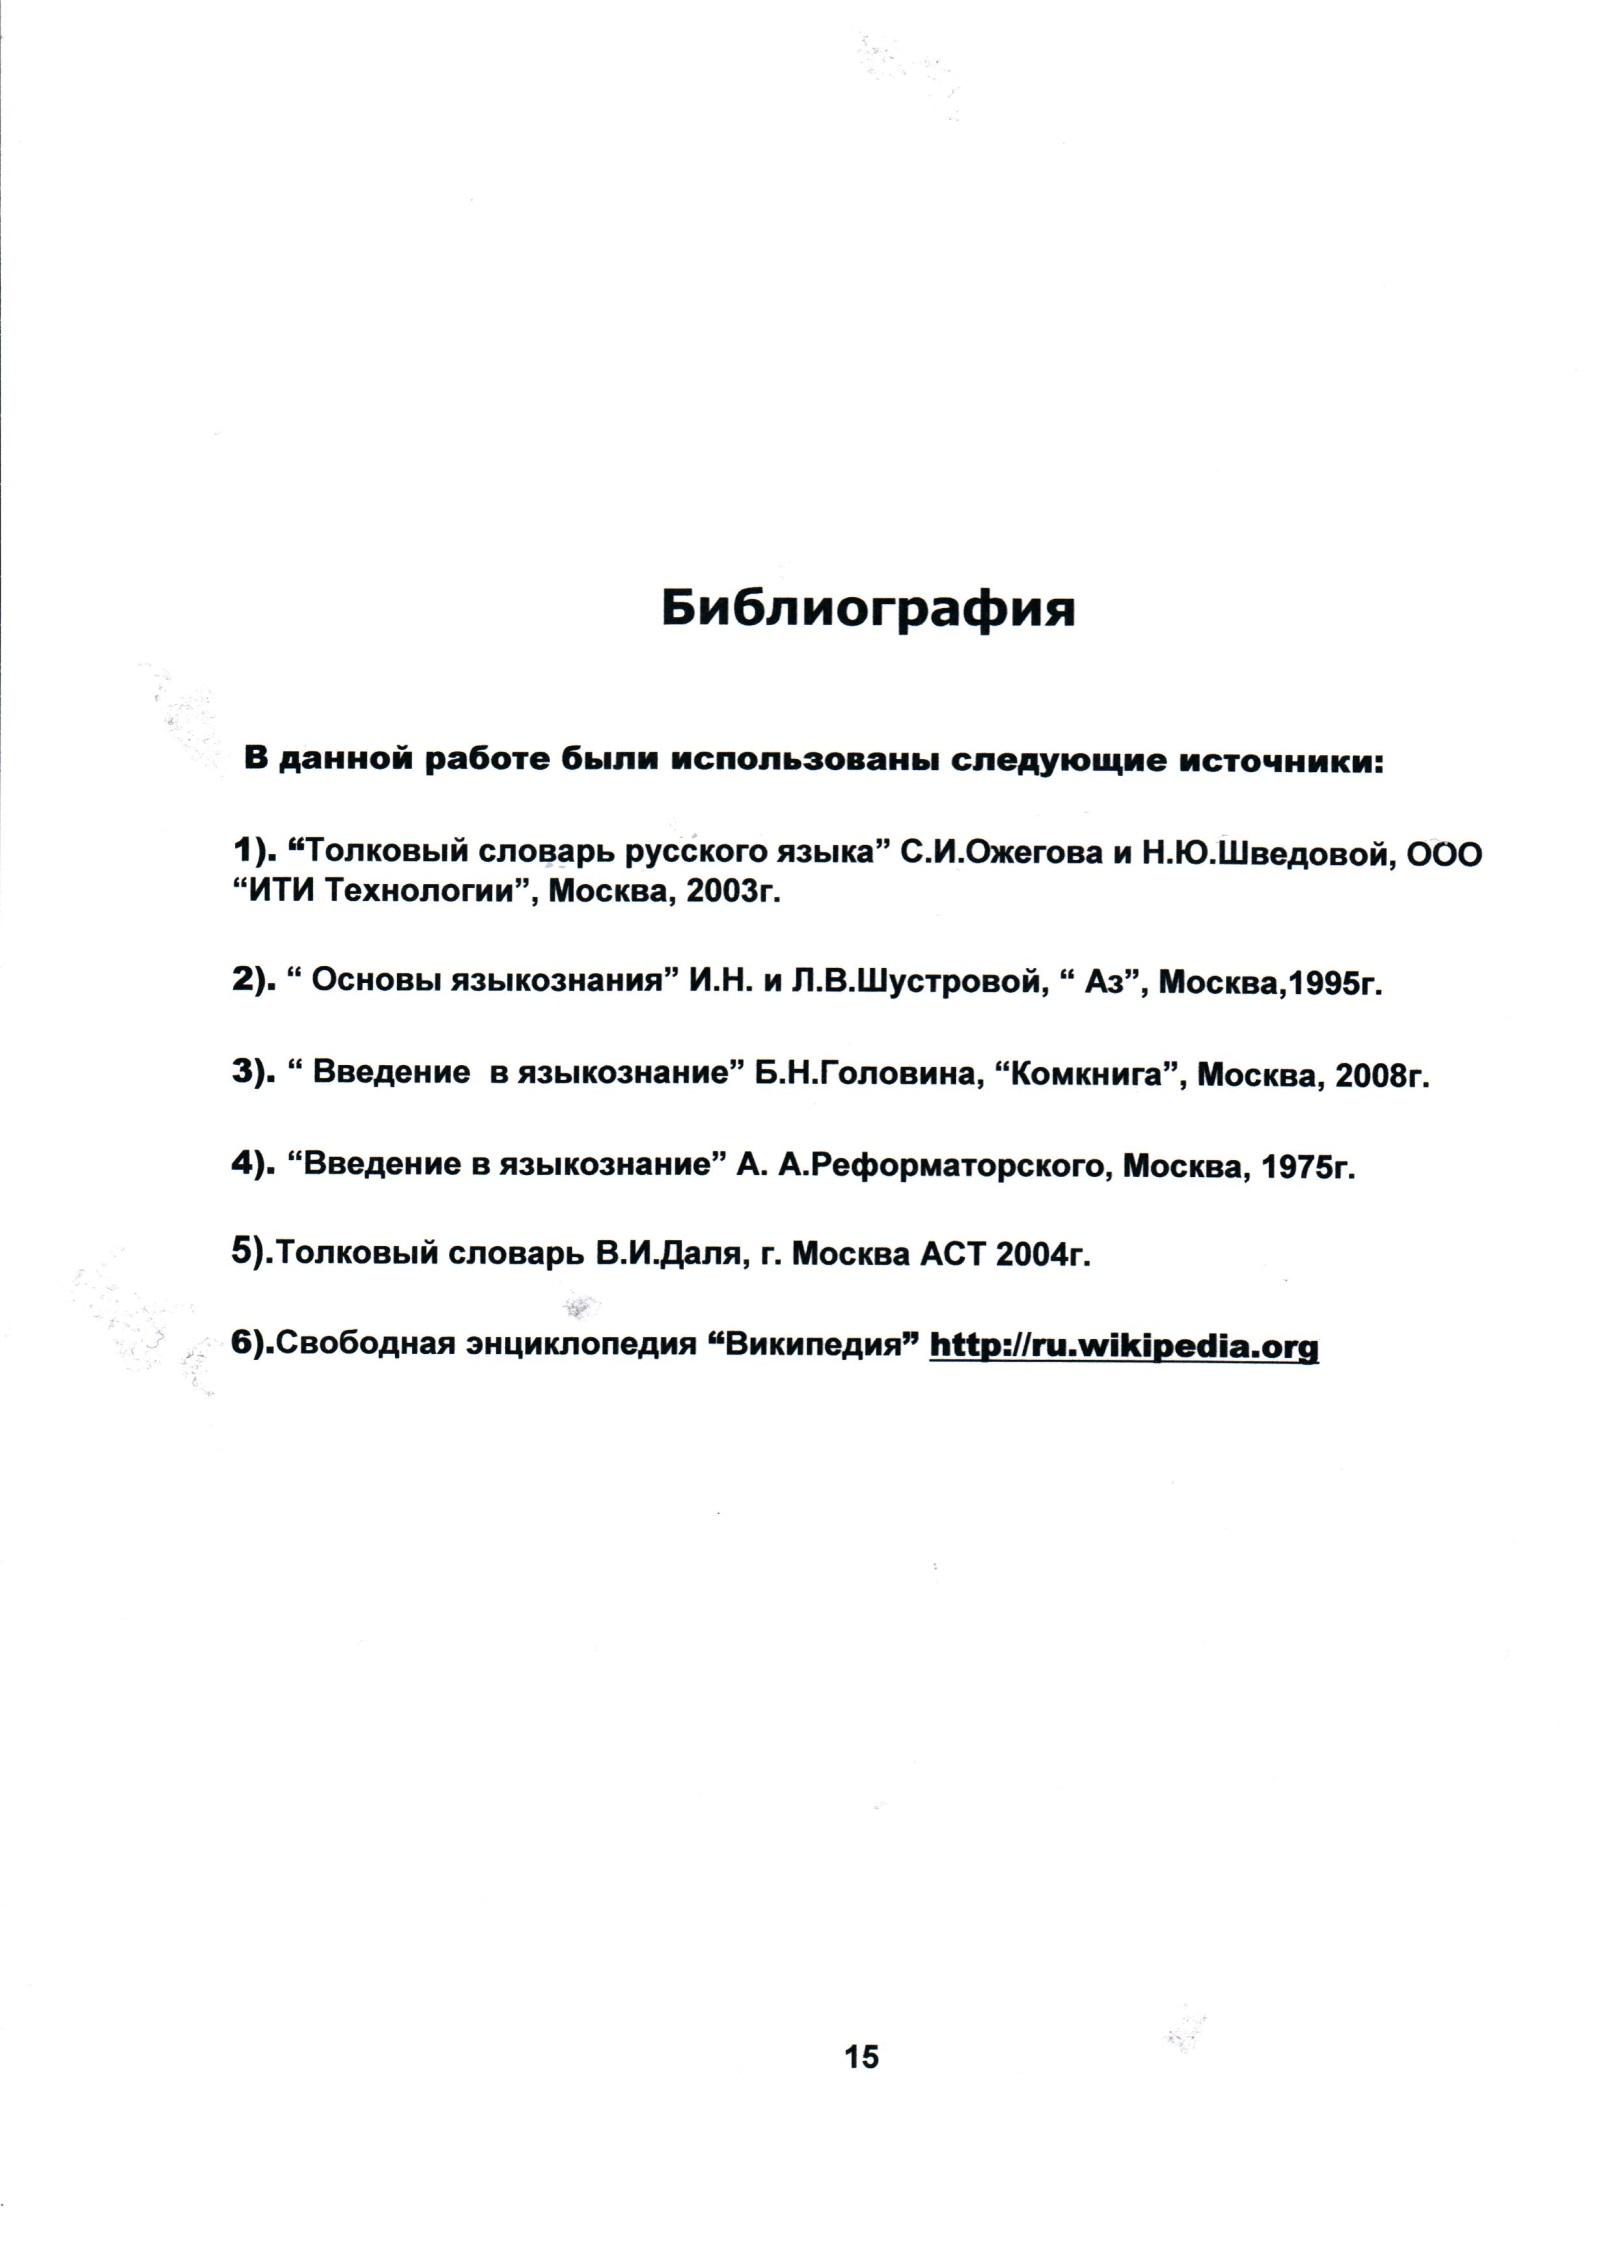 C:\Users\Ирина\Documents\Panasonic\MFS\Scan\20160225_105531.jpg